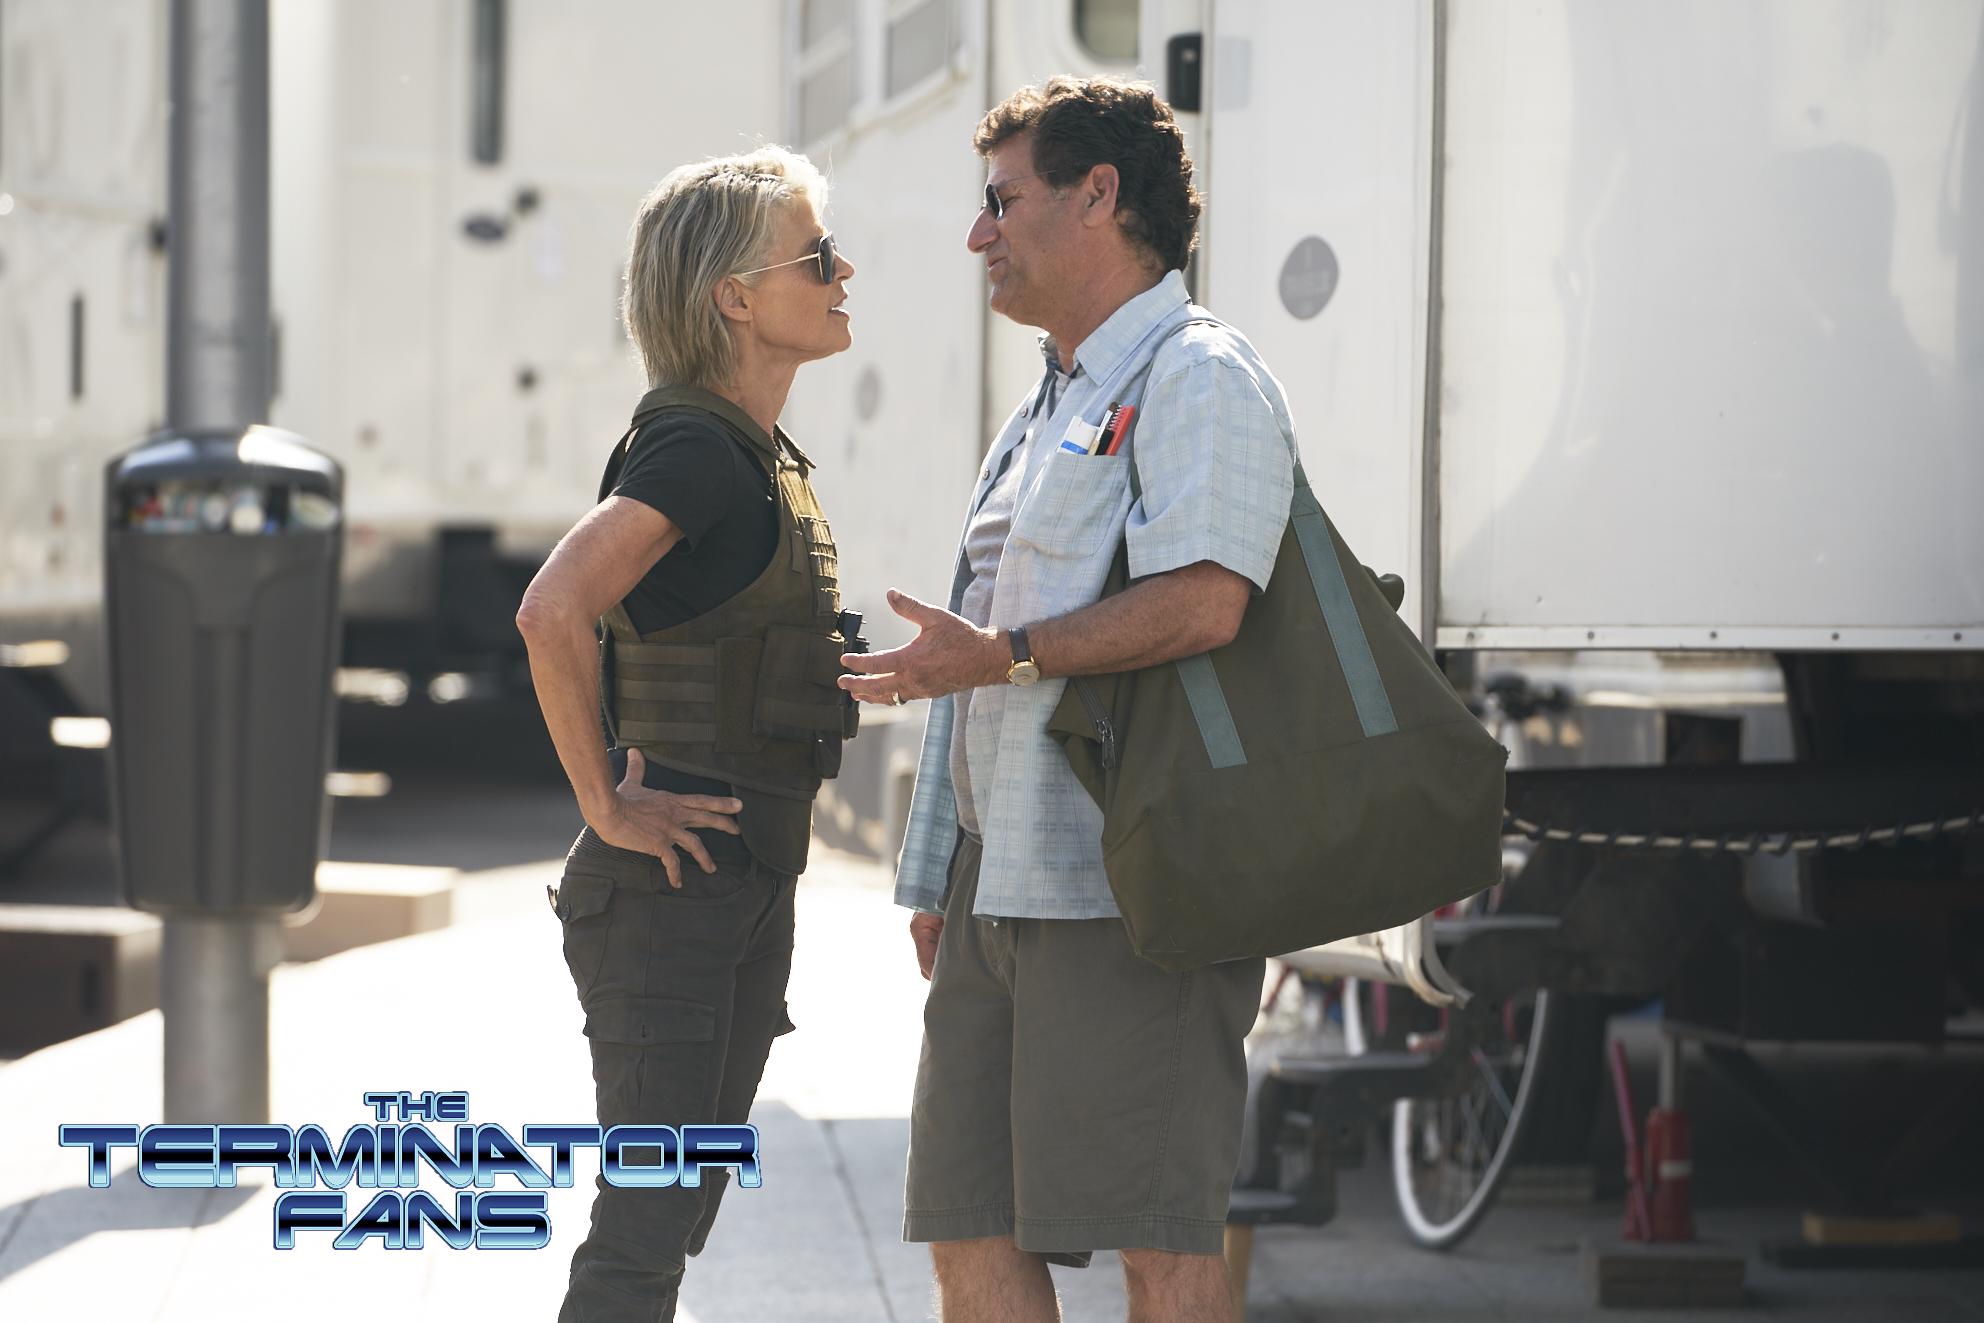 terminator 6 linda hamilton 2 - Primer vistazo a Linda Hamilton en Terminator 6